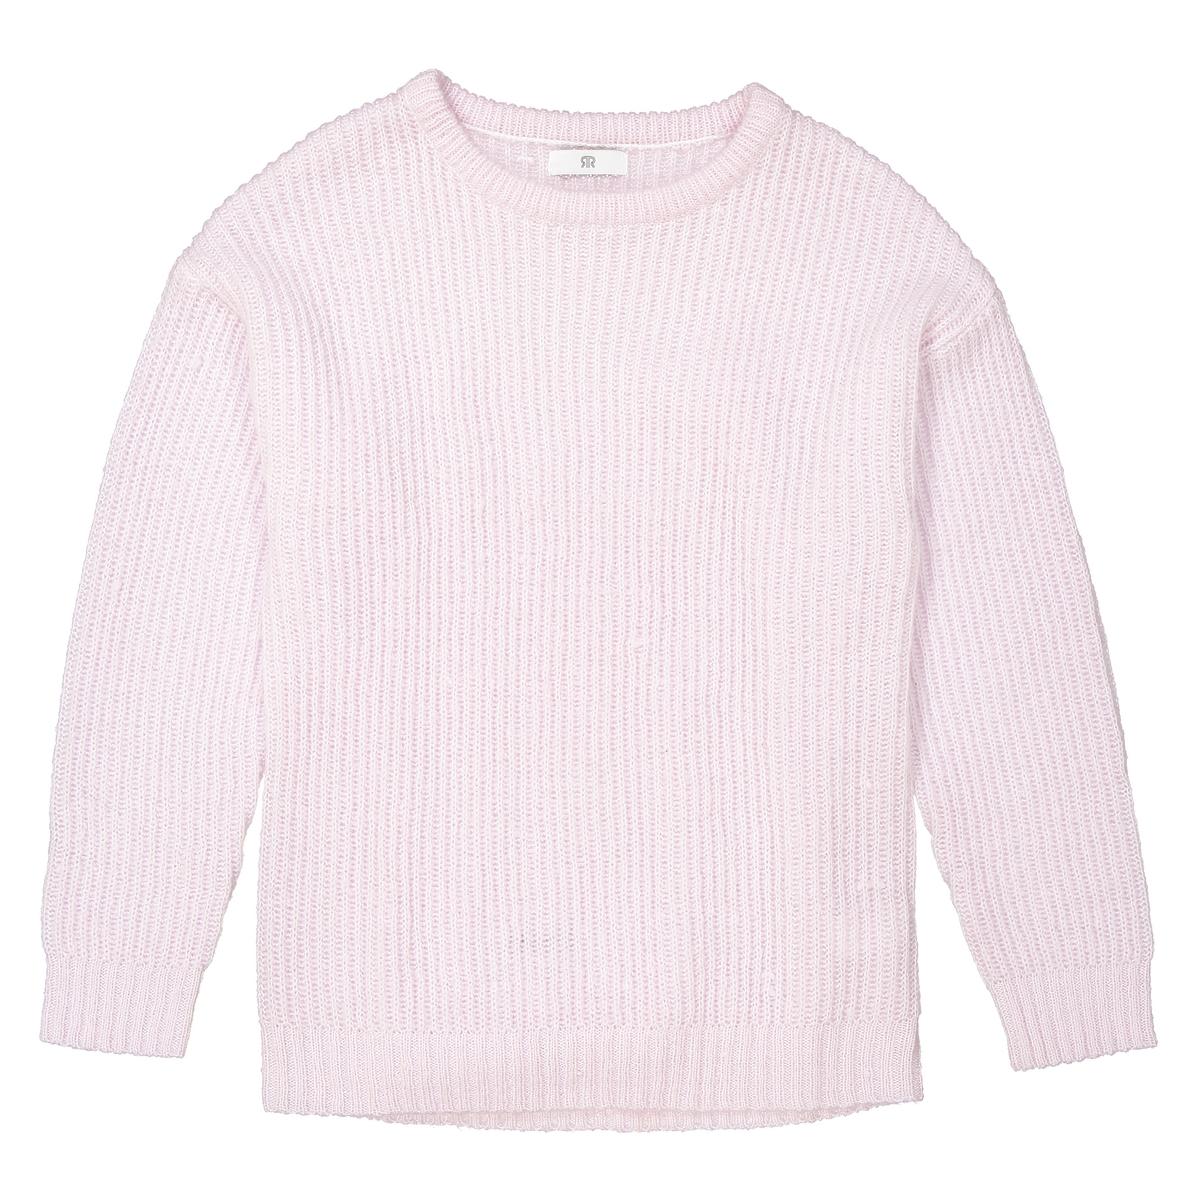 Sweter z okrągłym dekoltem oversize 10-16 lat